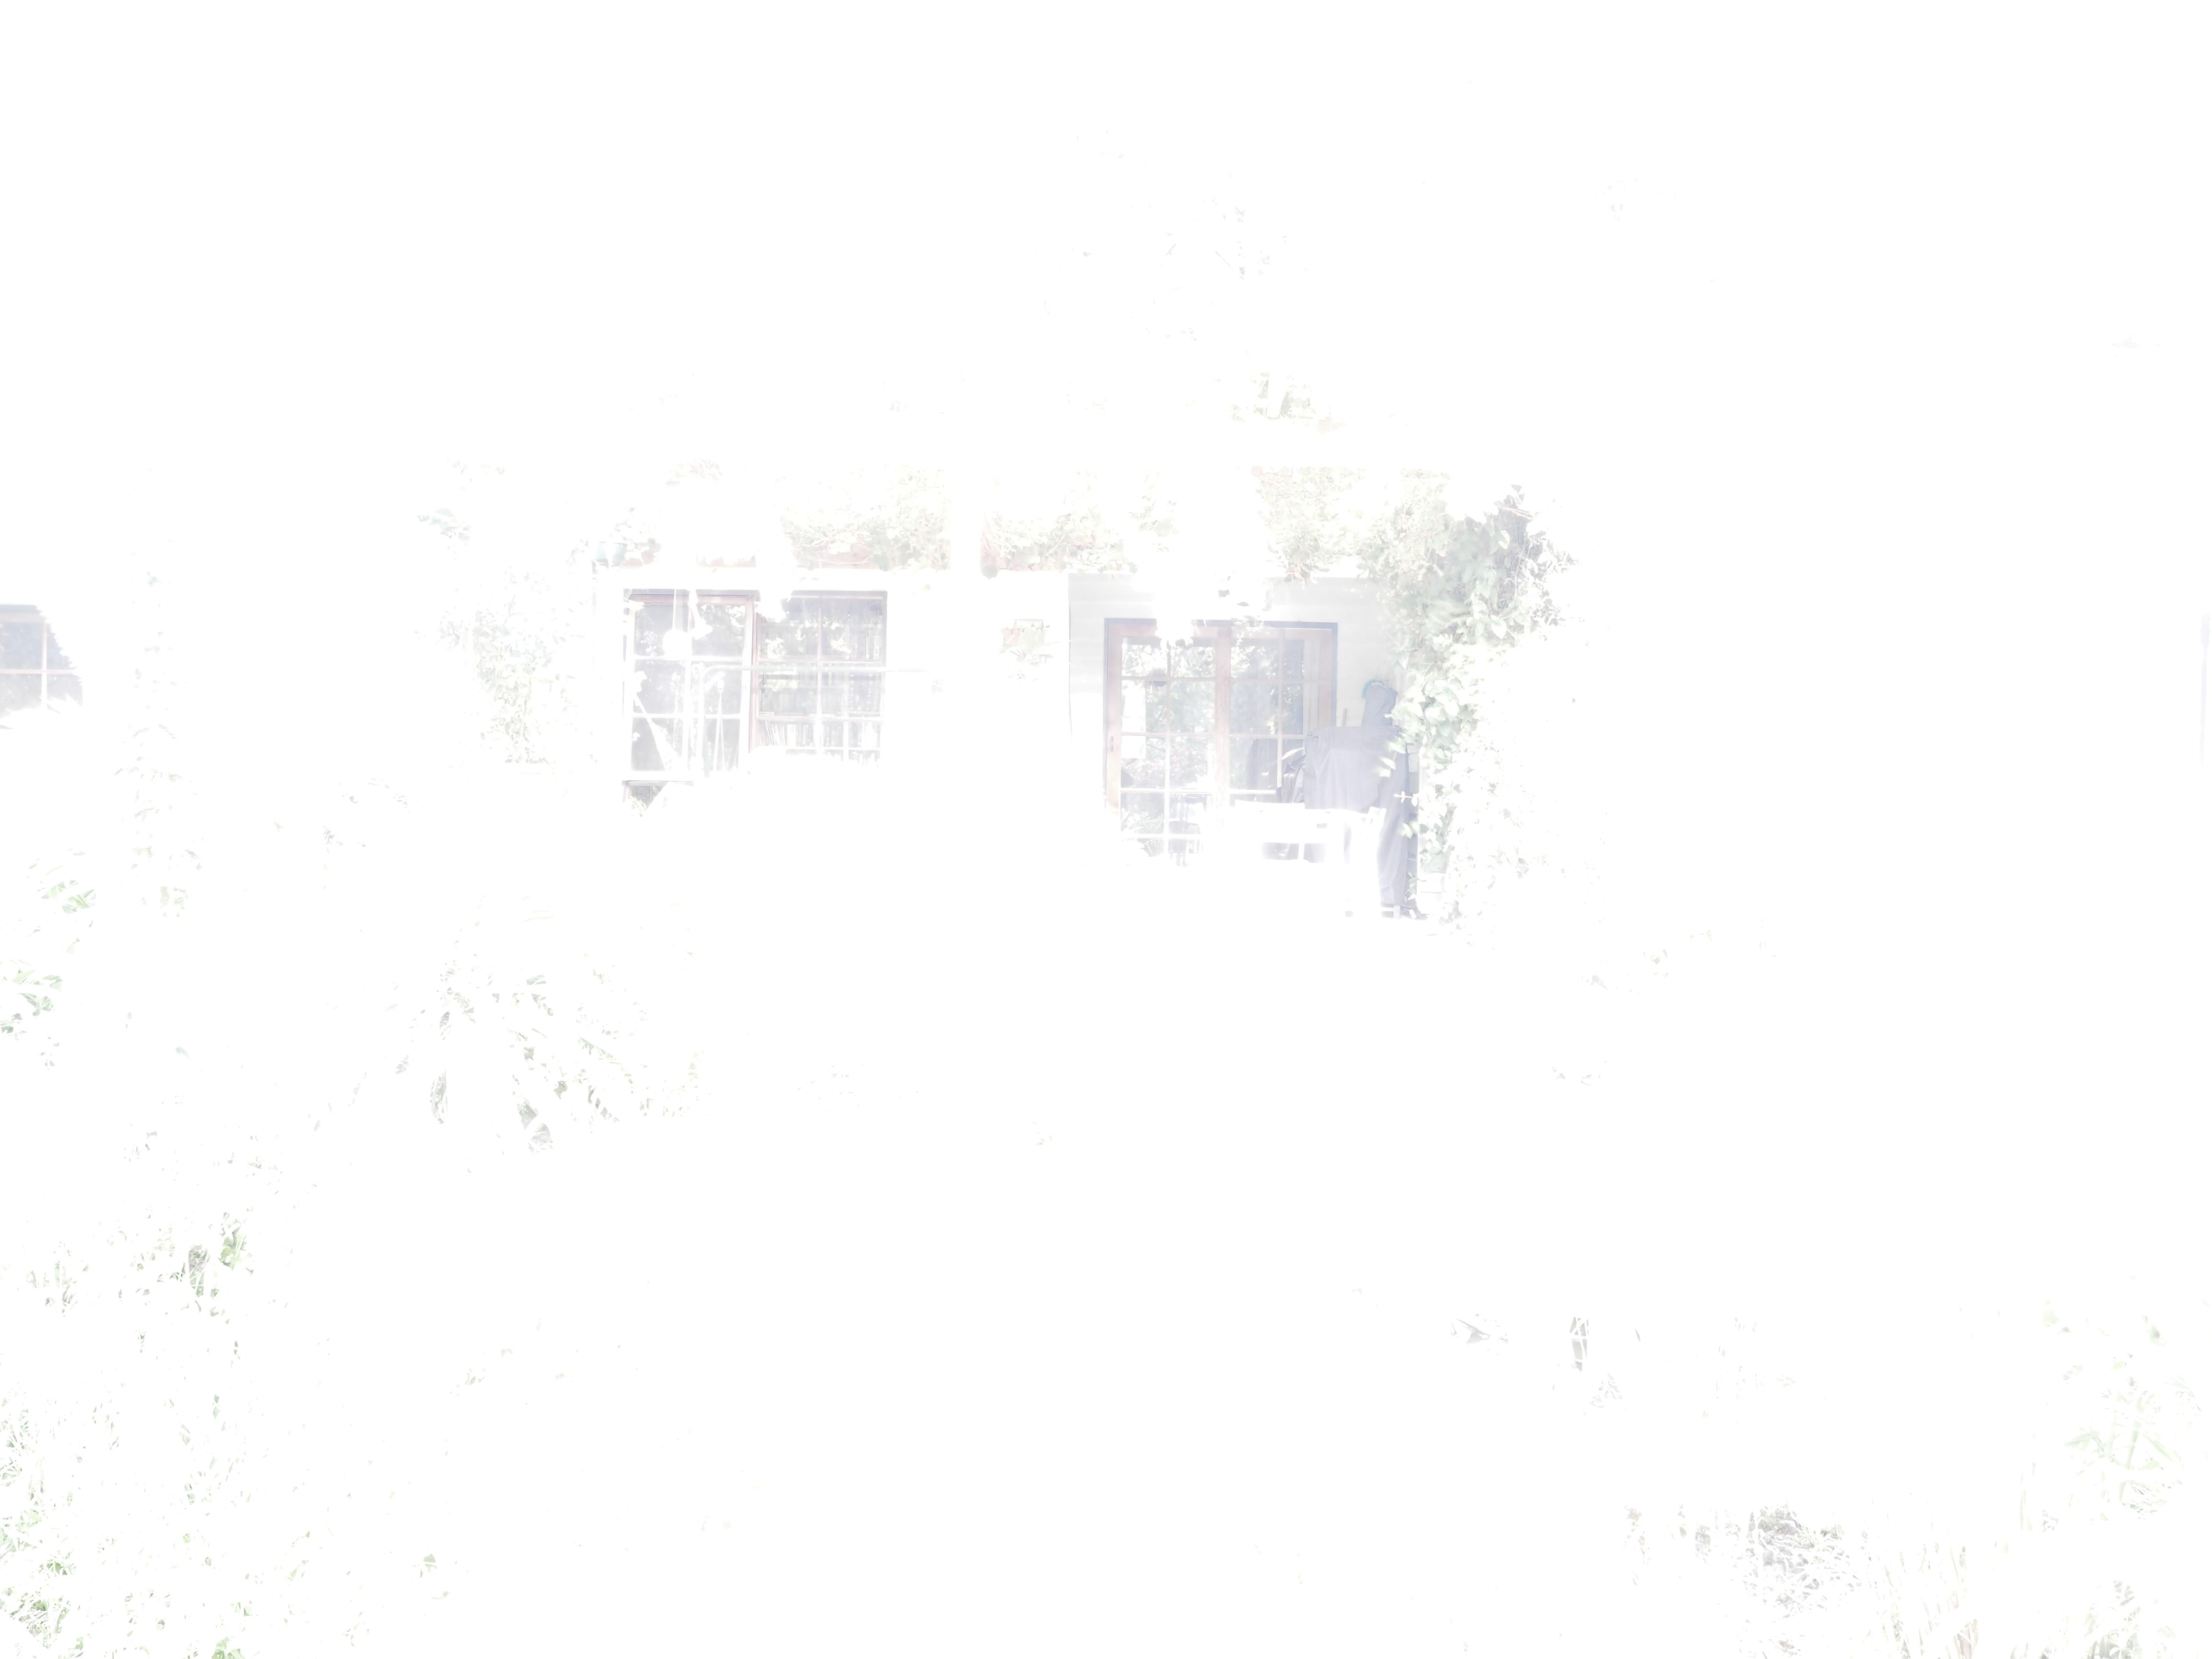 HDR-5-4.jpeg